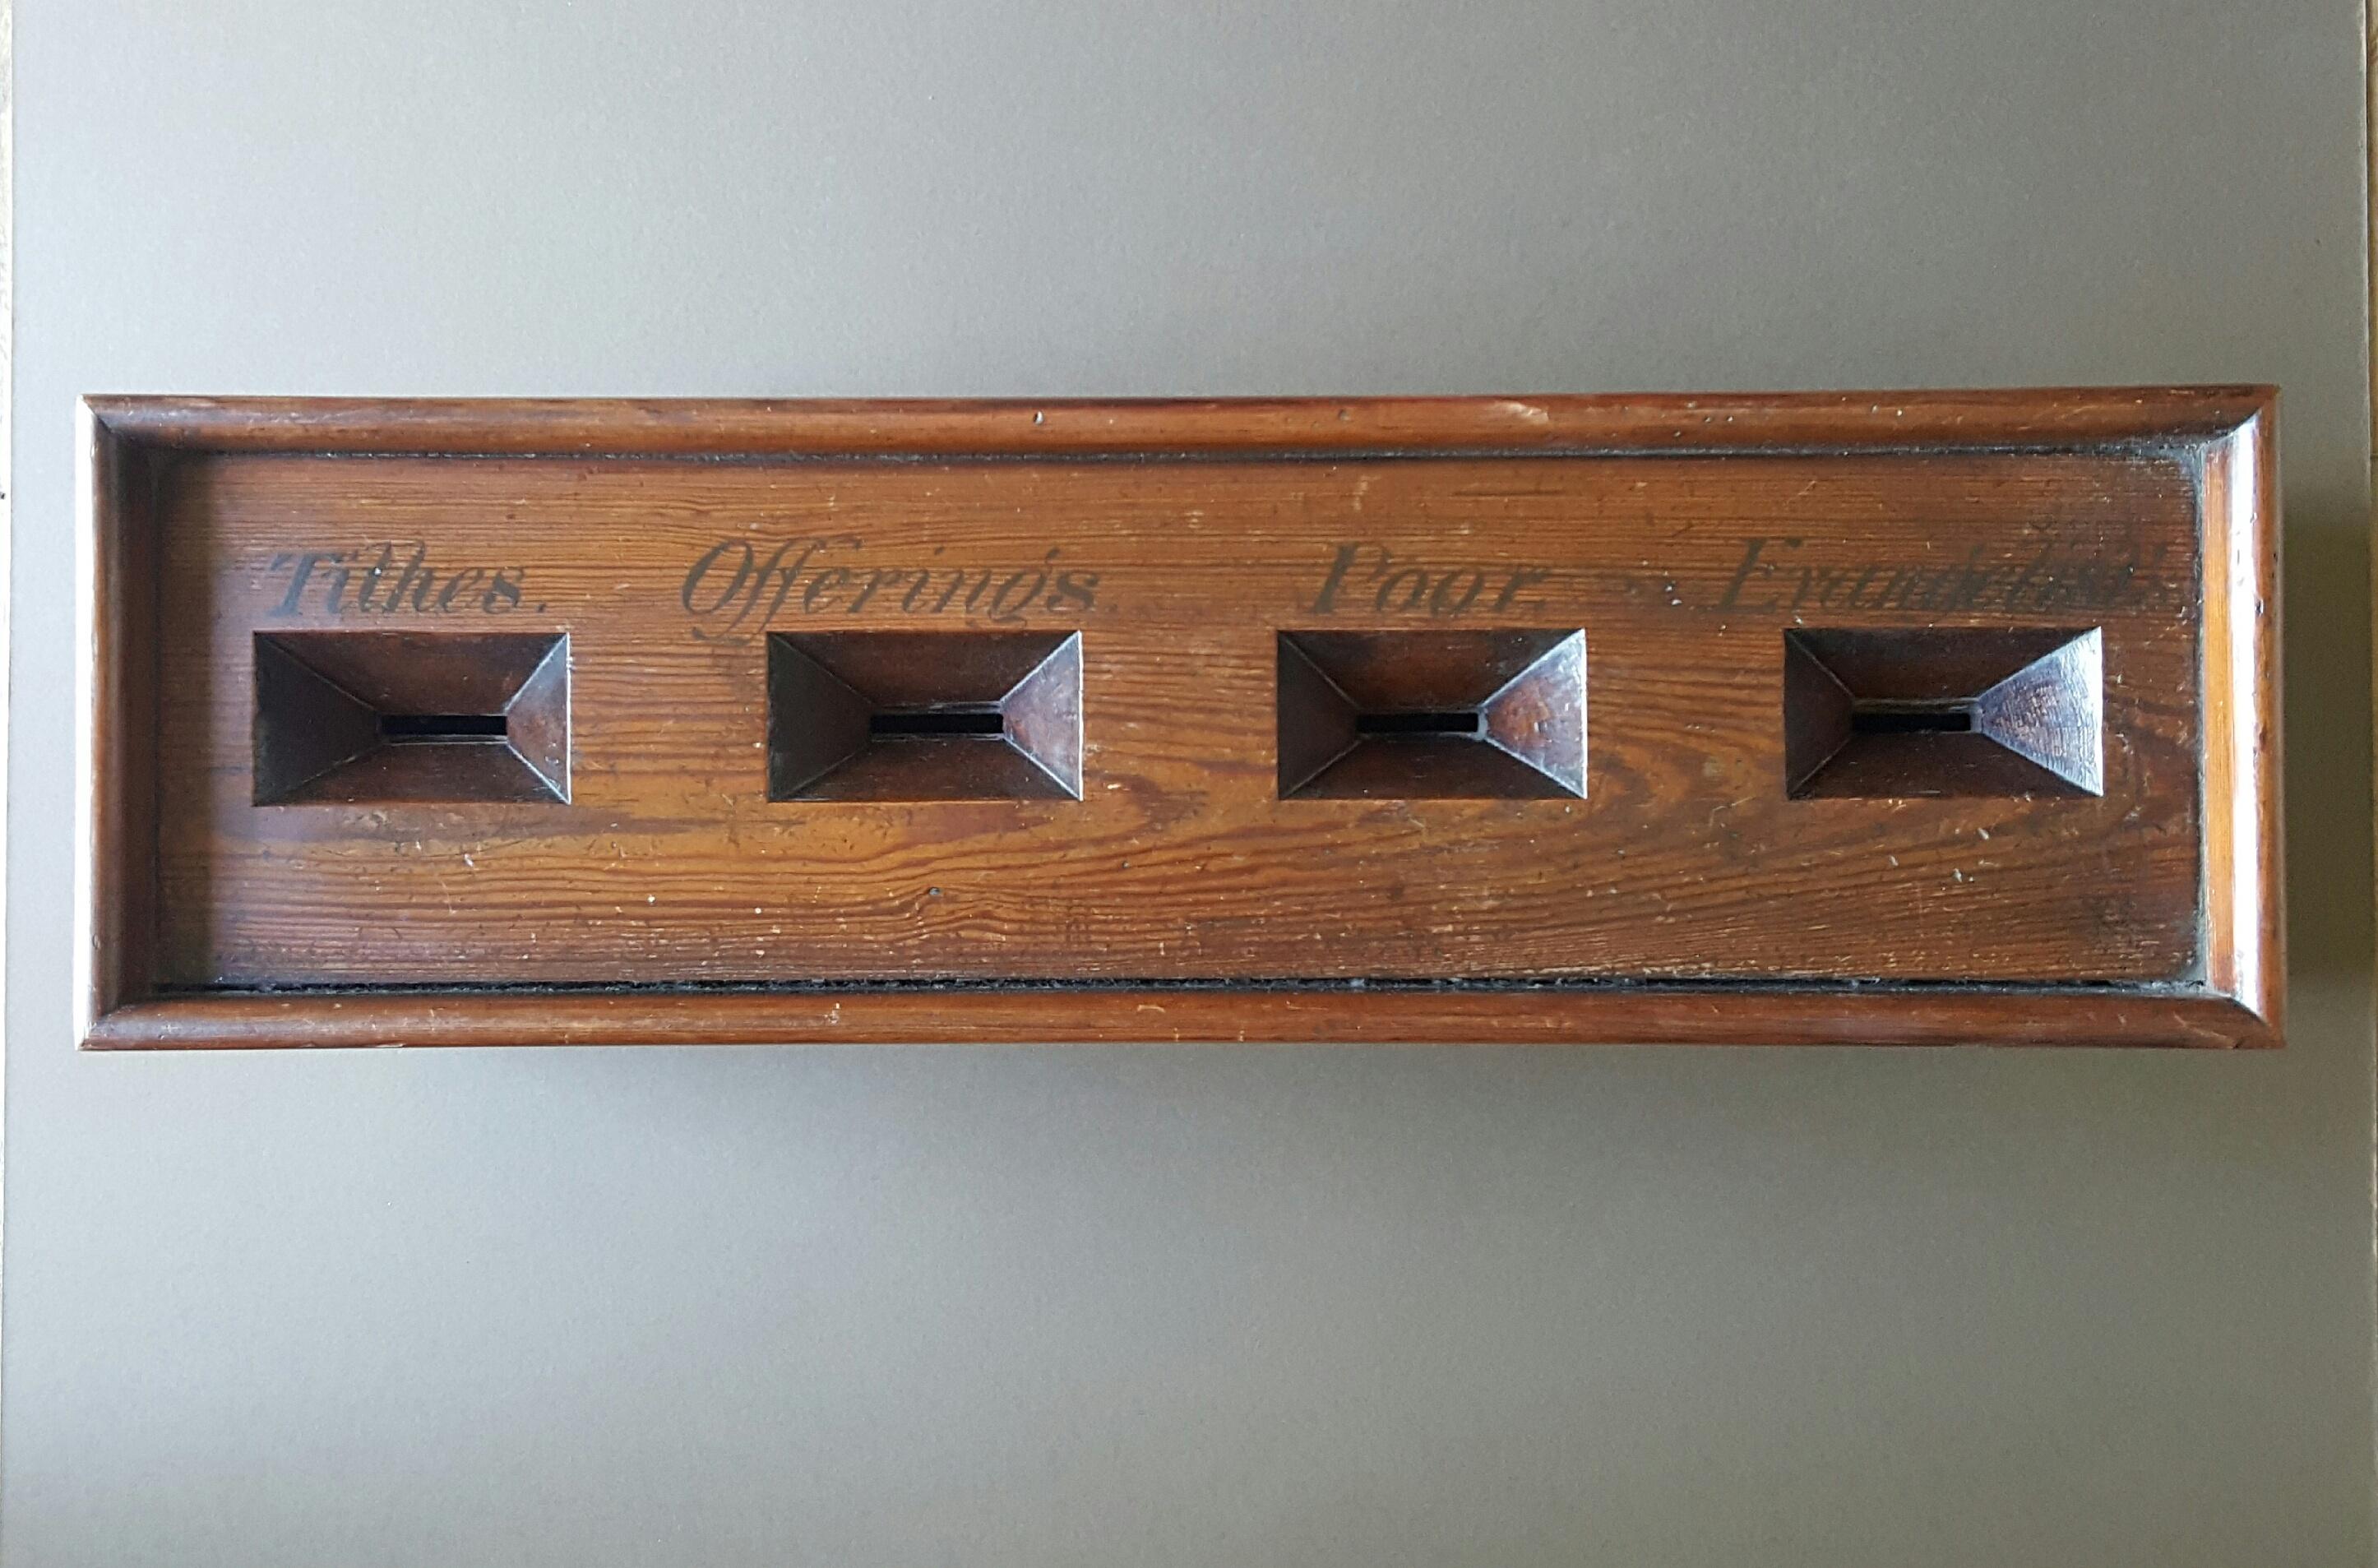 Victorian Offertory Box